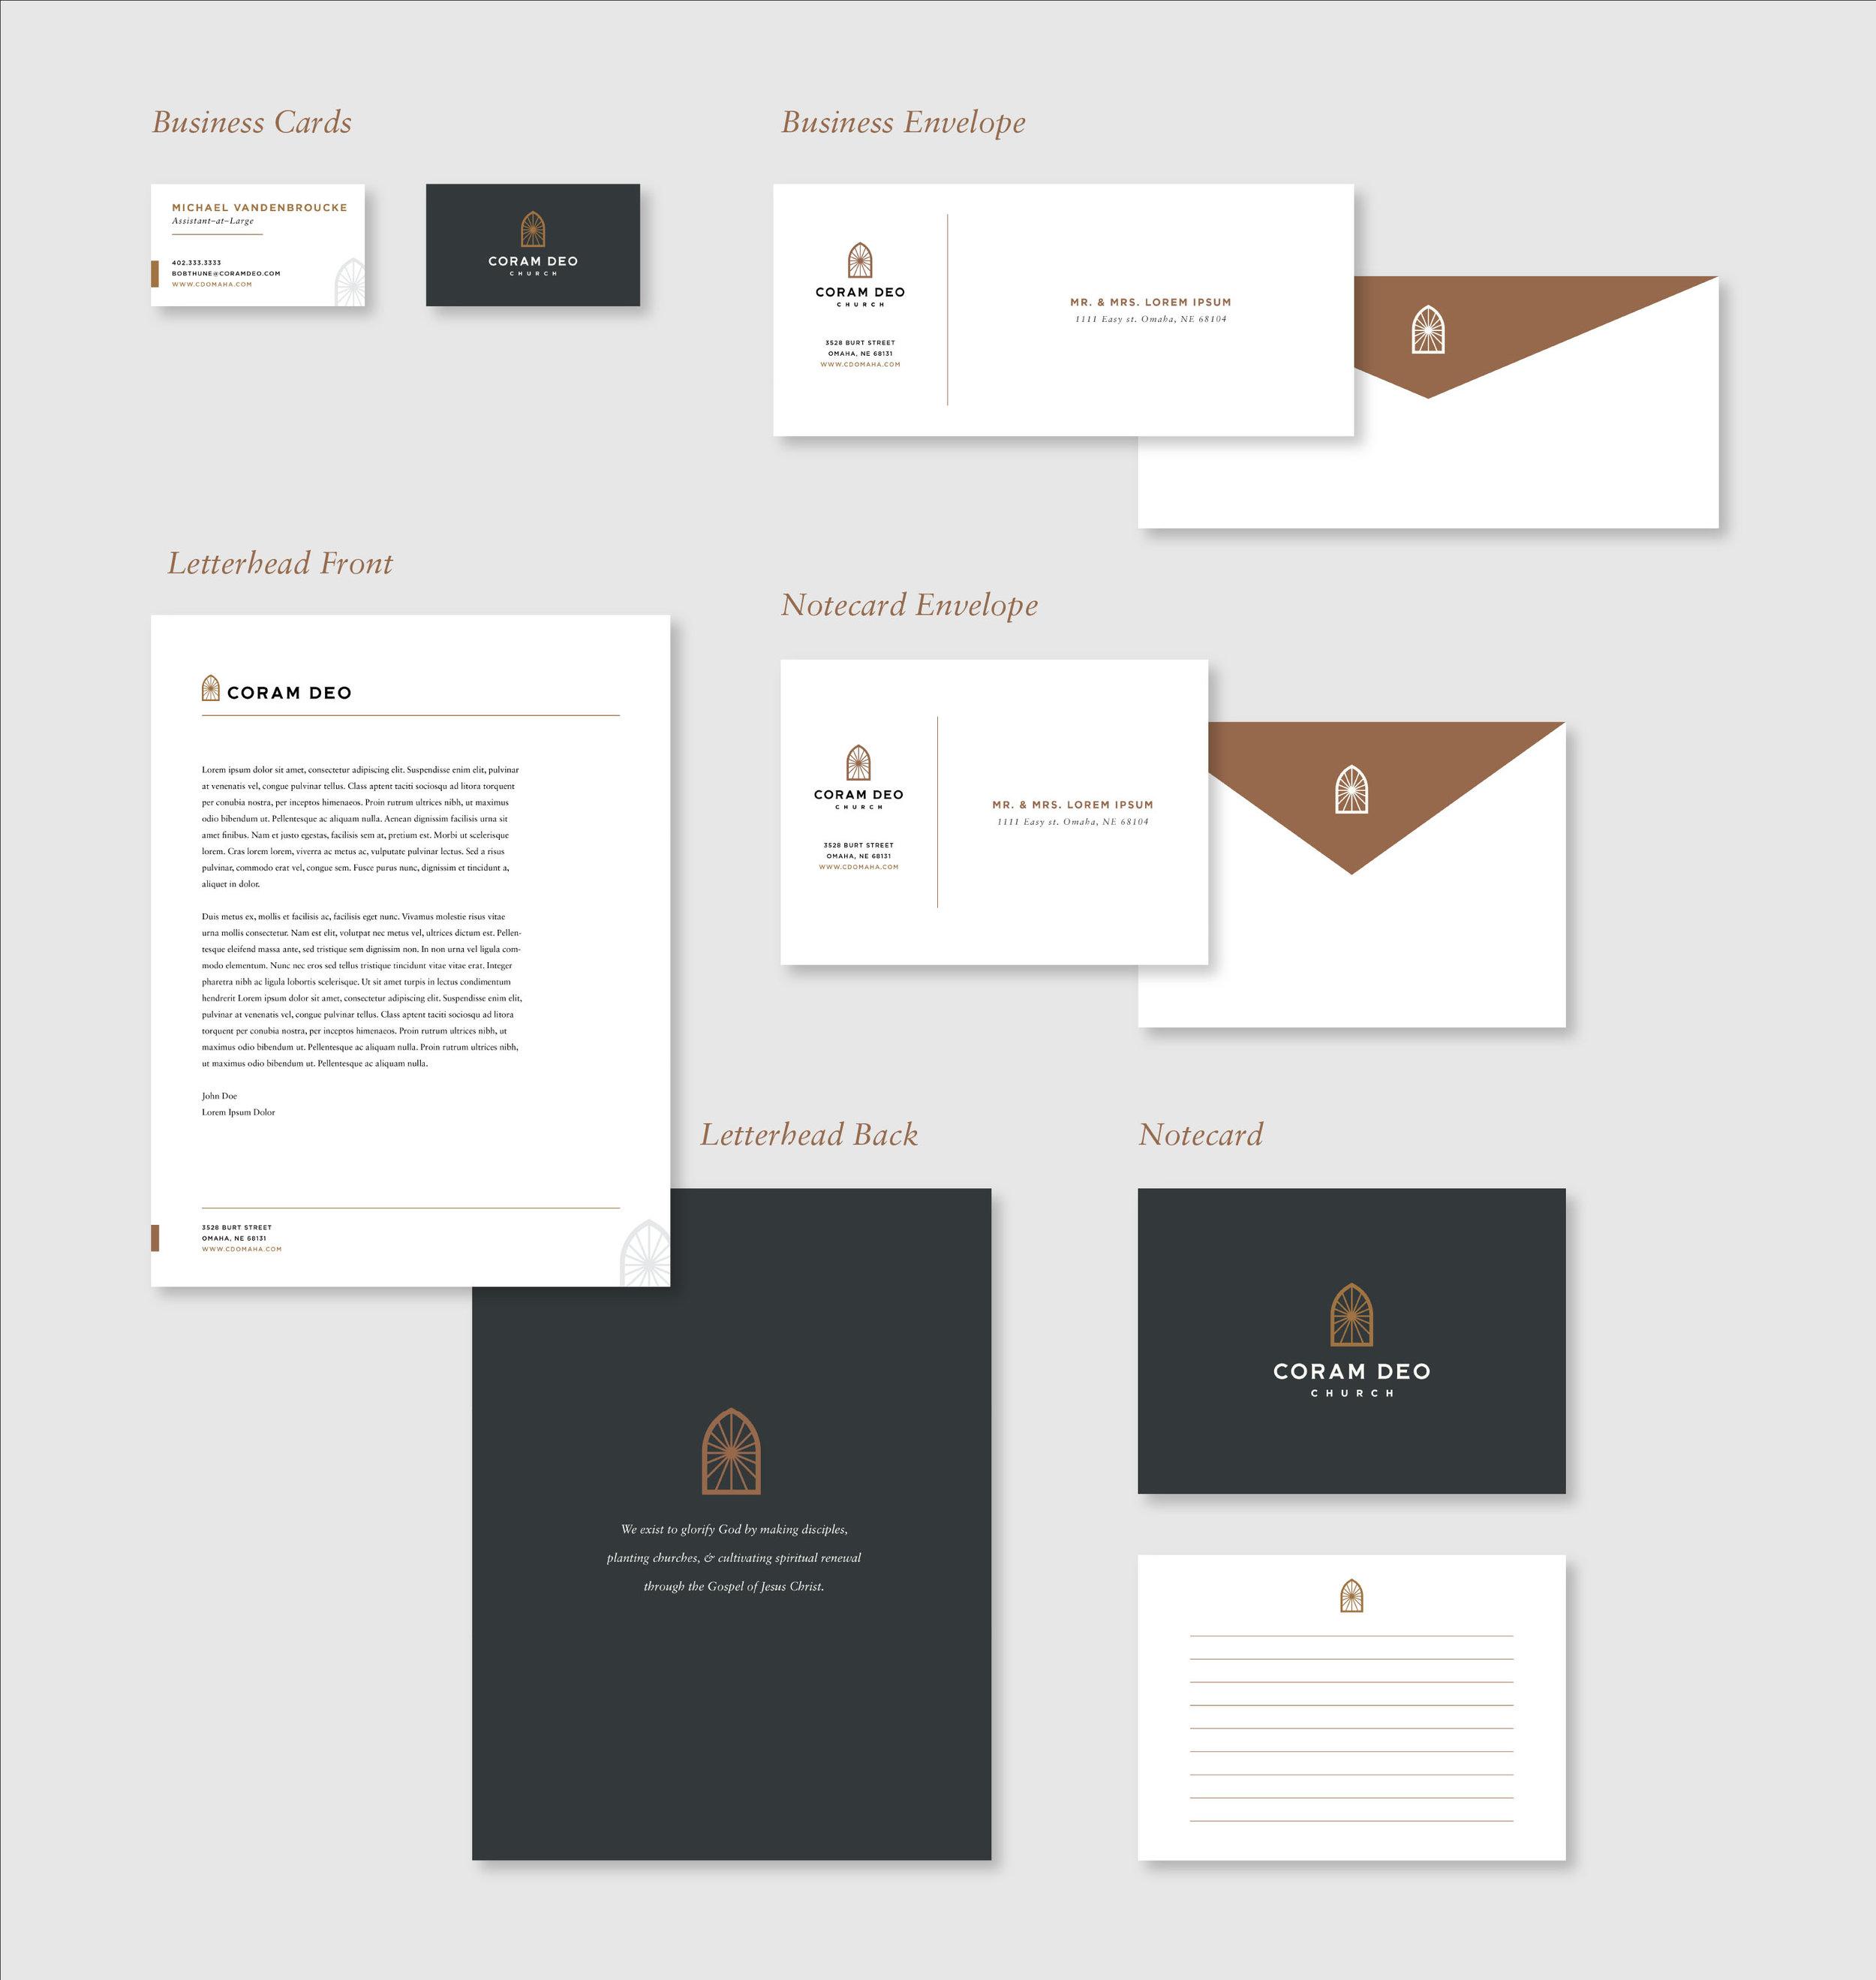 Fruitful_Design_Graphic_Design_Omaha_Nebraska_Coram Deo Stationery.jpg